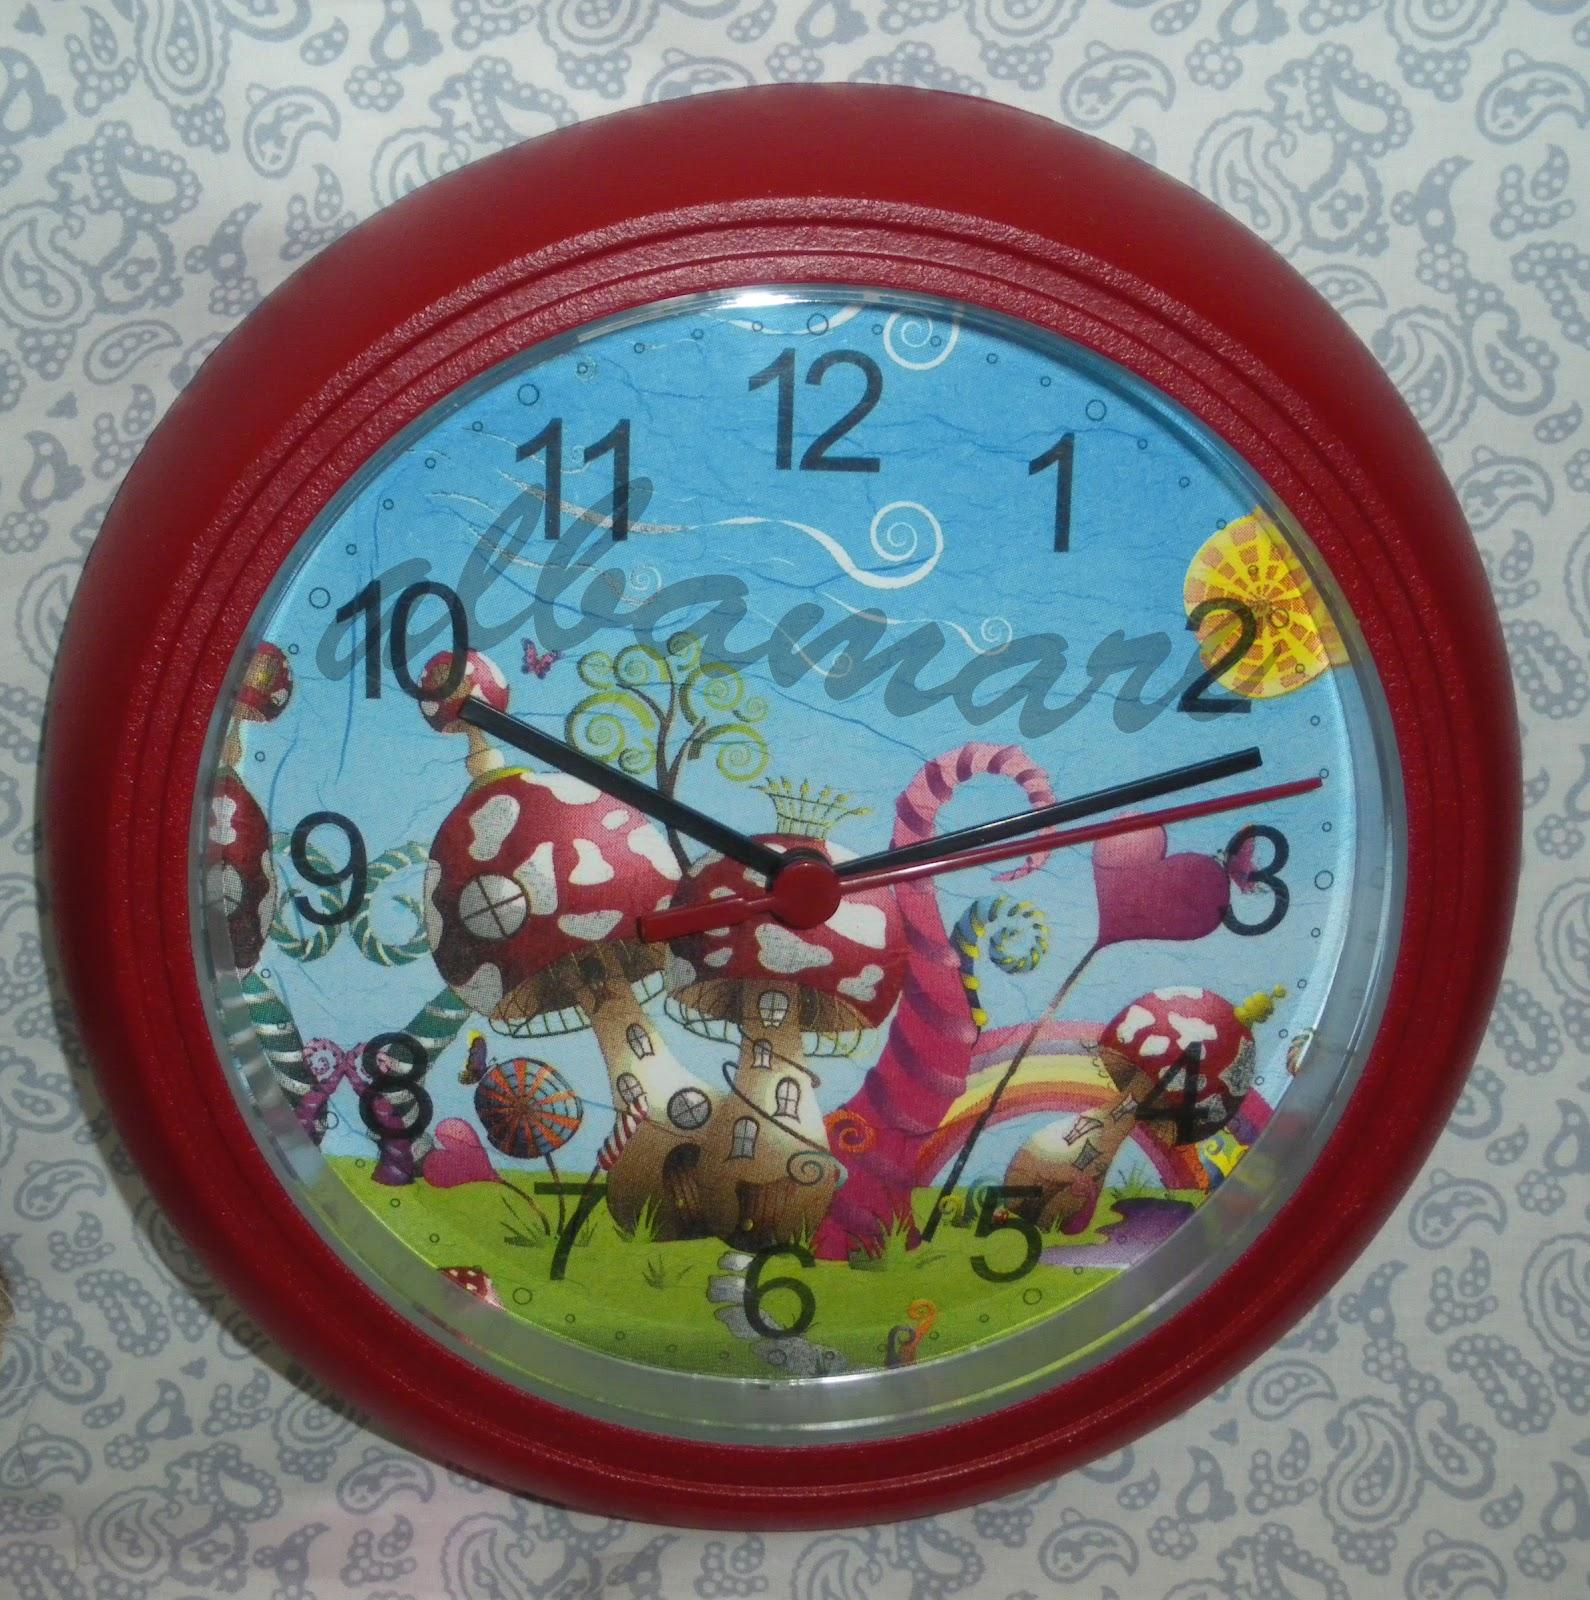 Albamare manualidades handicrafts reloj infantil infantile clock - Manualidades relojes infantiles ...